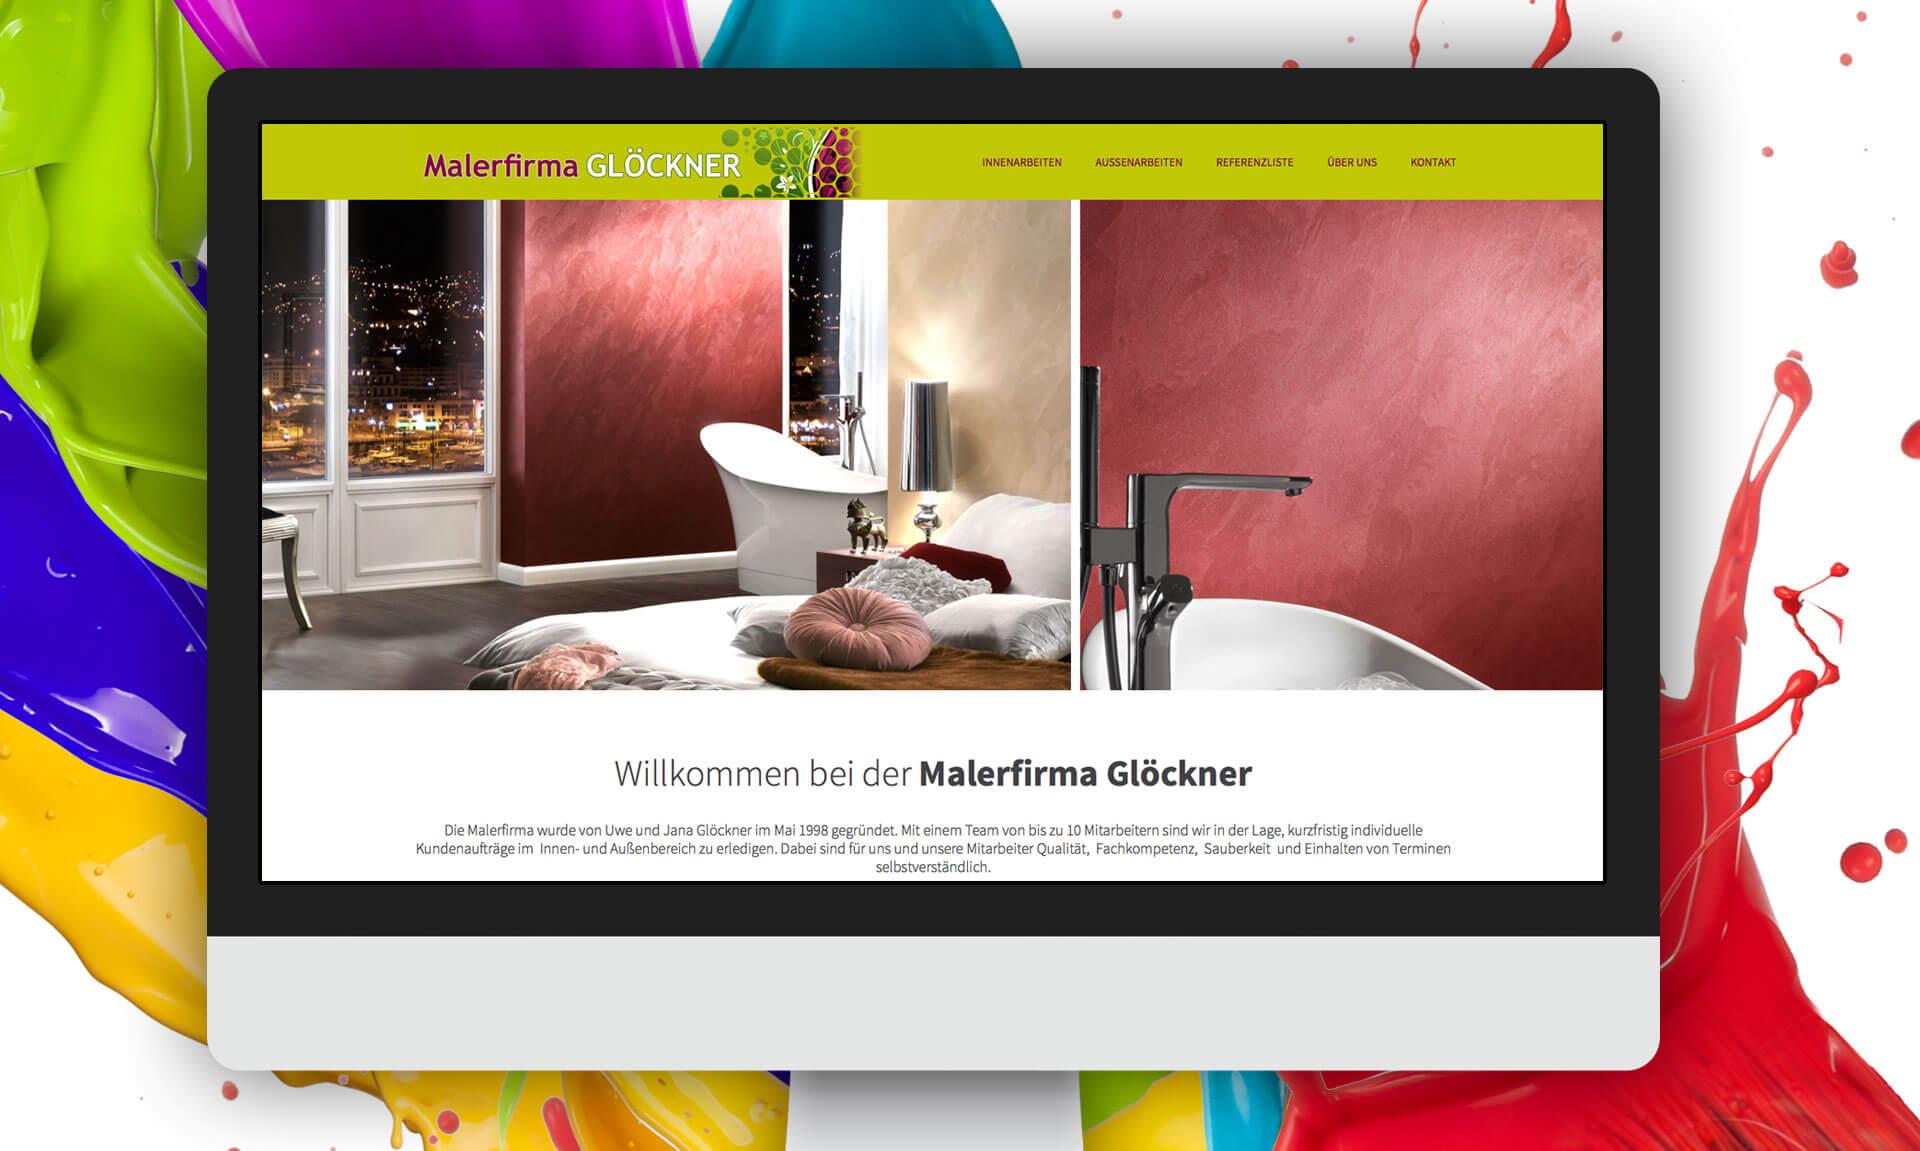 Malerfirma Uwe Glöckner - Referenz Maho Werbeagentur Dresden